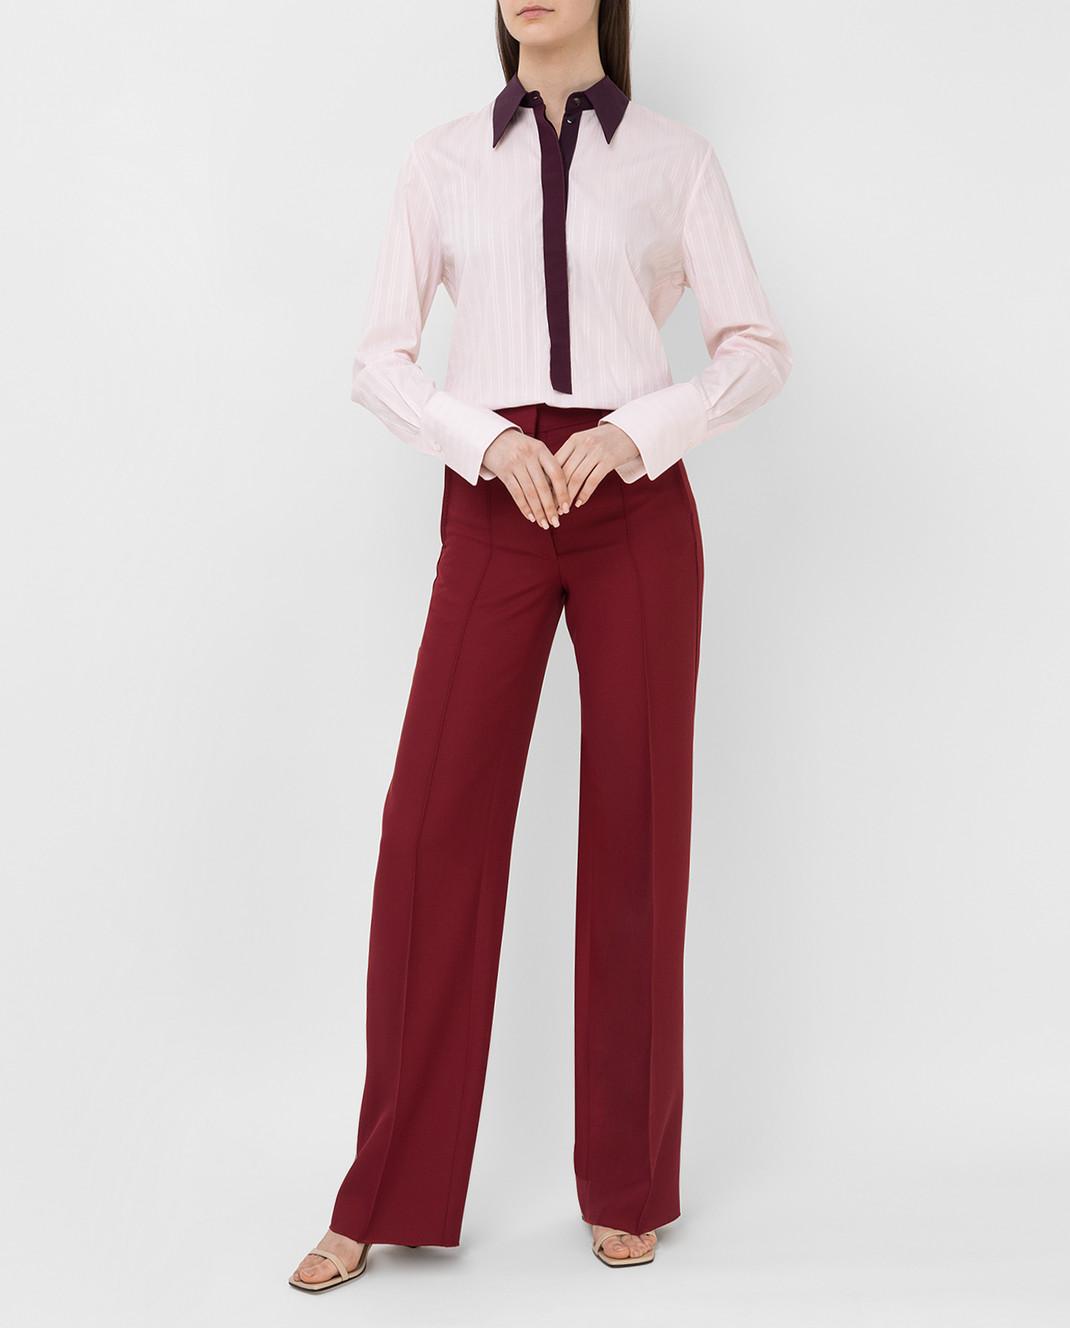 Victoria by Victoria Beckham Розовая рубашка SHVV117 изображение 2